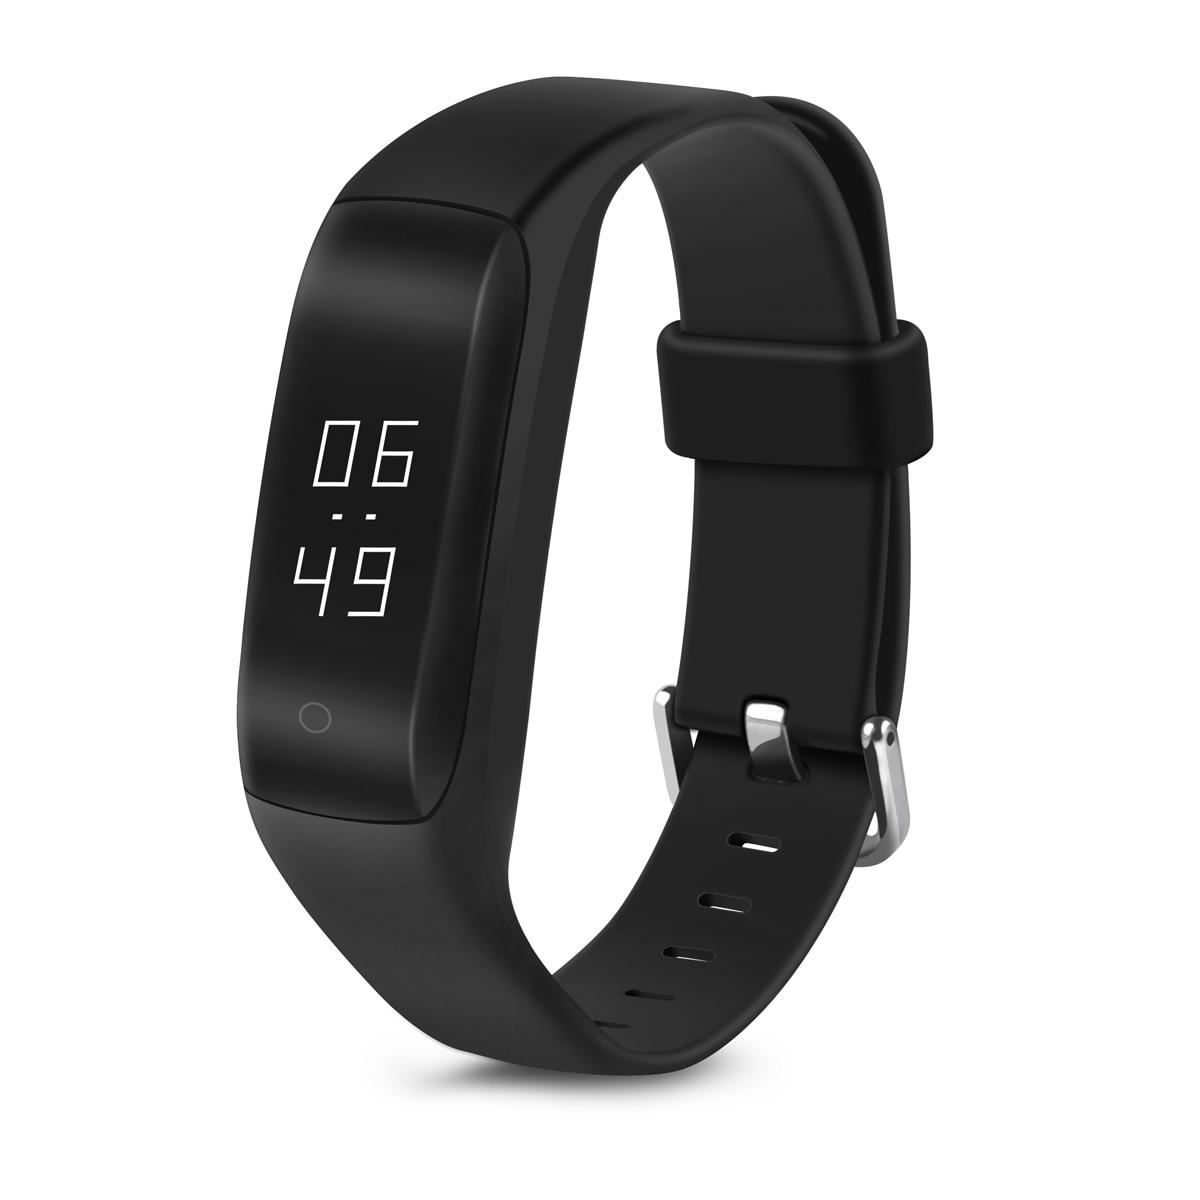 C5 Bluetooth font b Smart b font Bracelet Heart Rate Monitoring Fitness Tracker Wristband Waterproof Sports